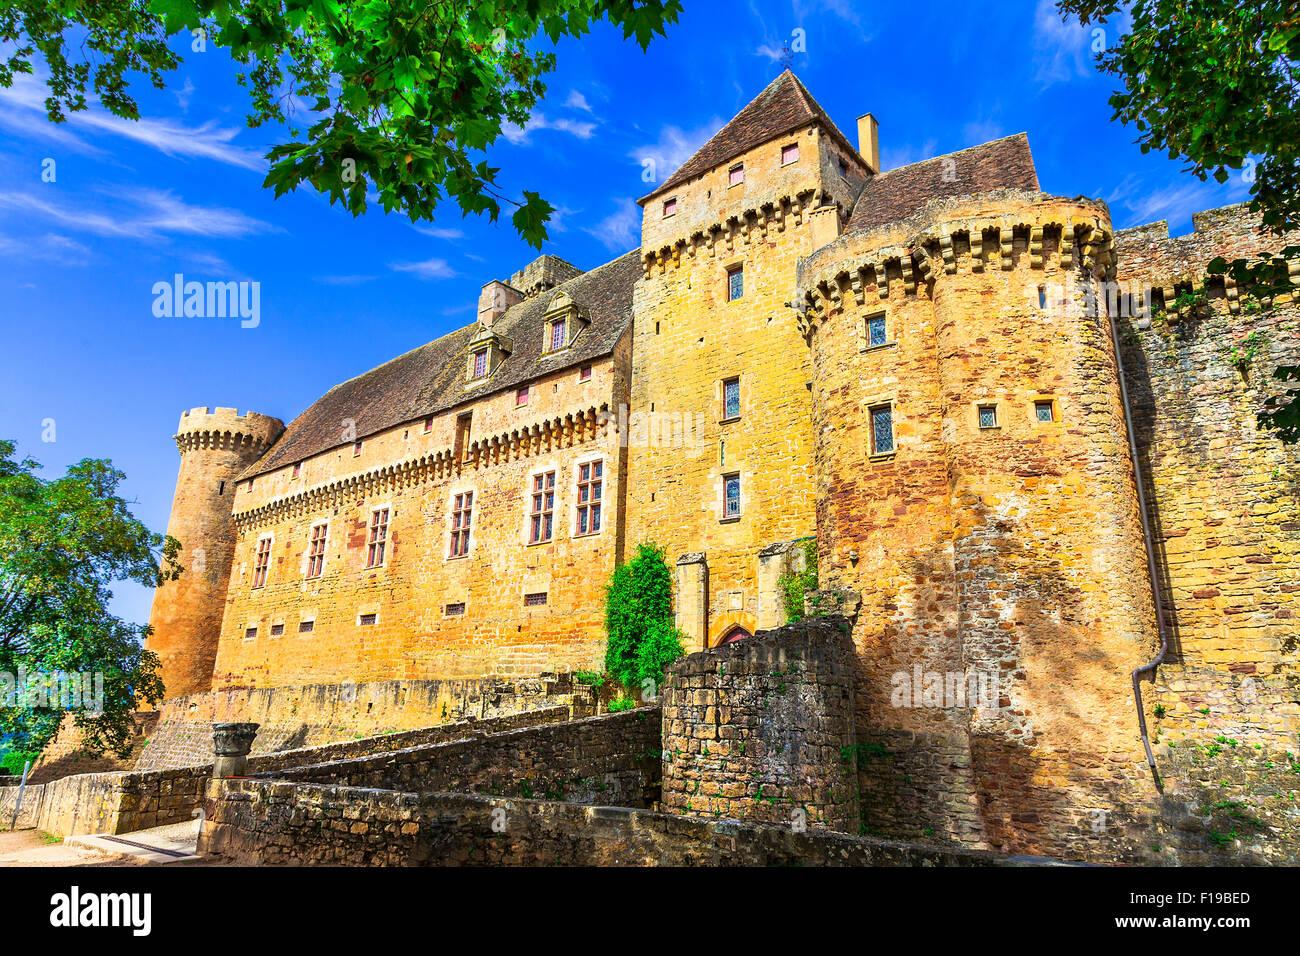 impressive medieval castle Castelnau in France (Prudhomat, Lot department) ,France. Stock Photo